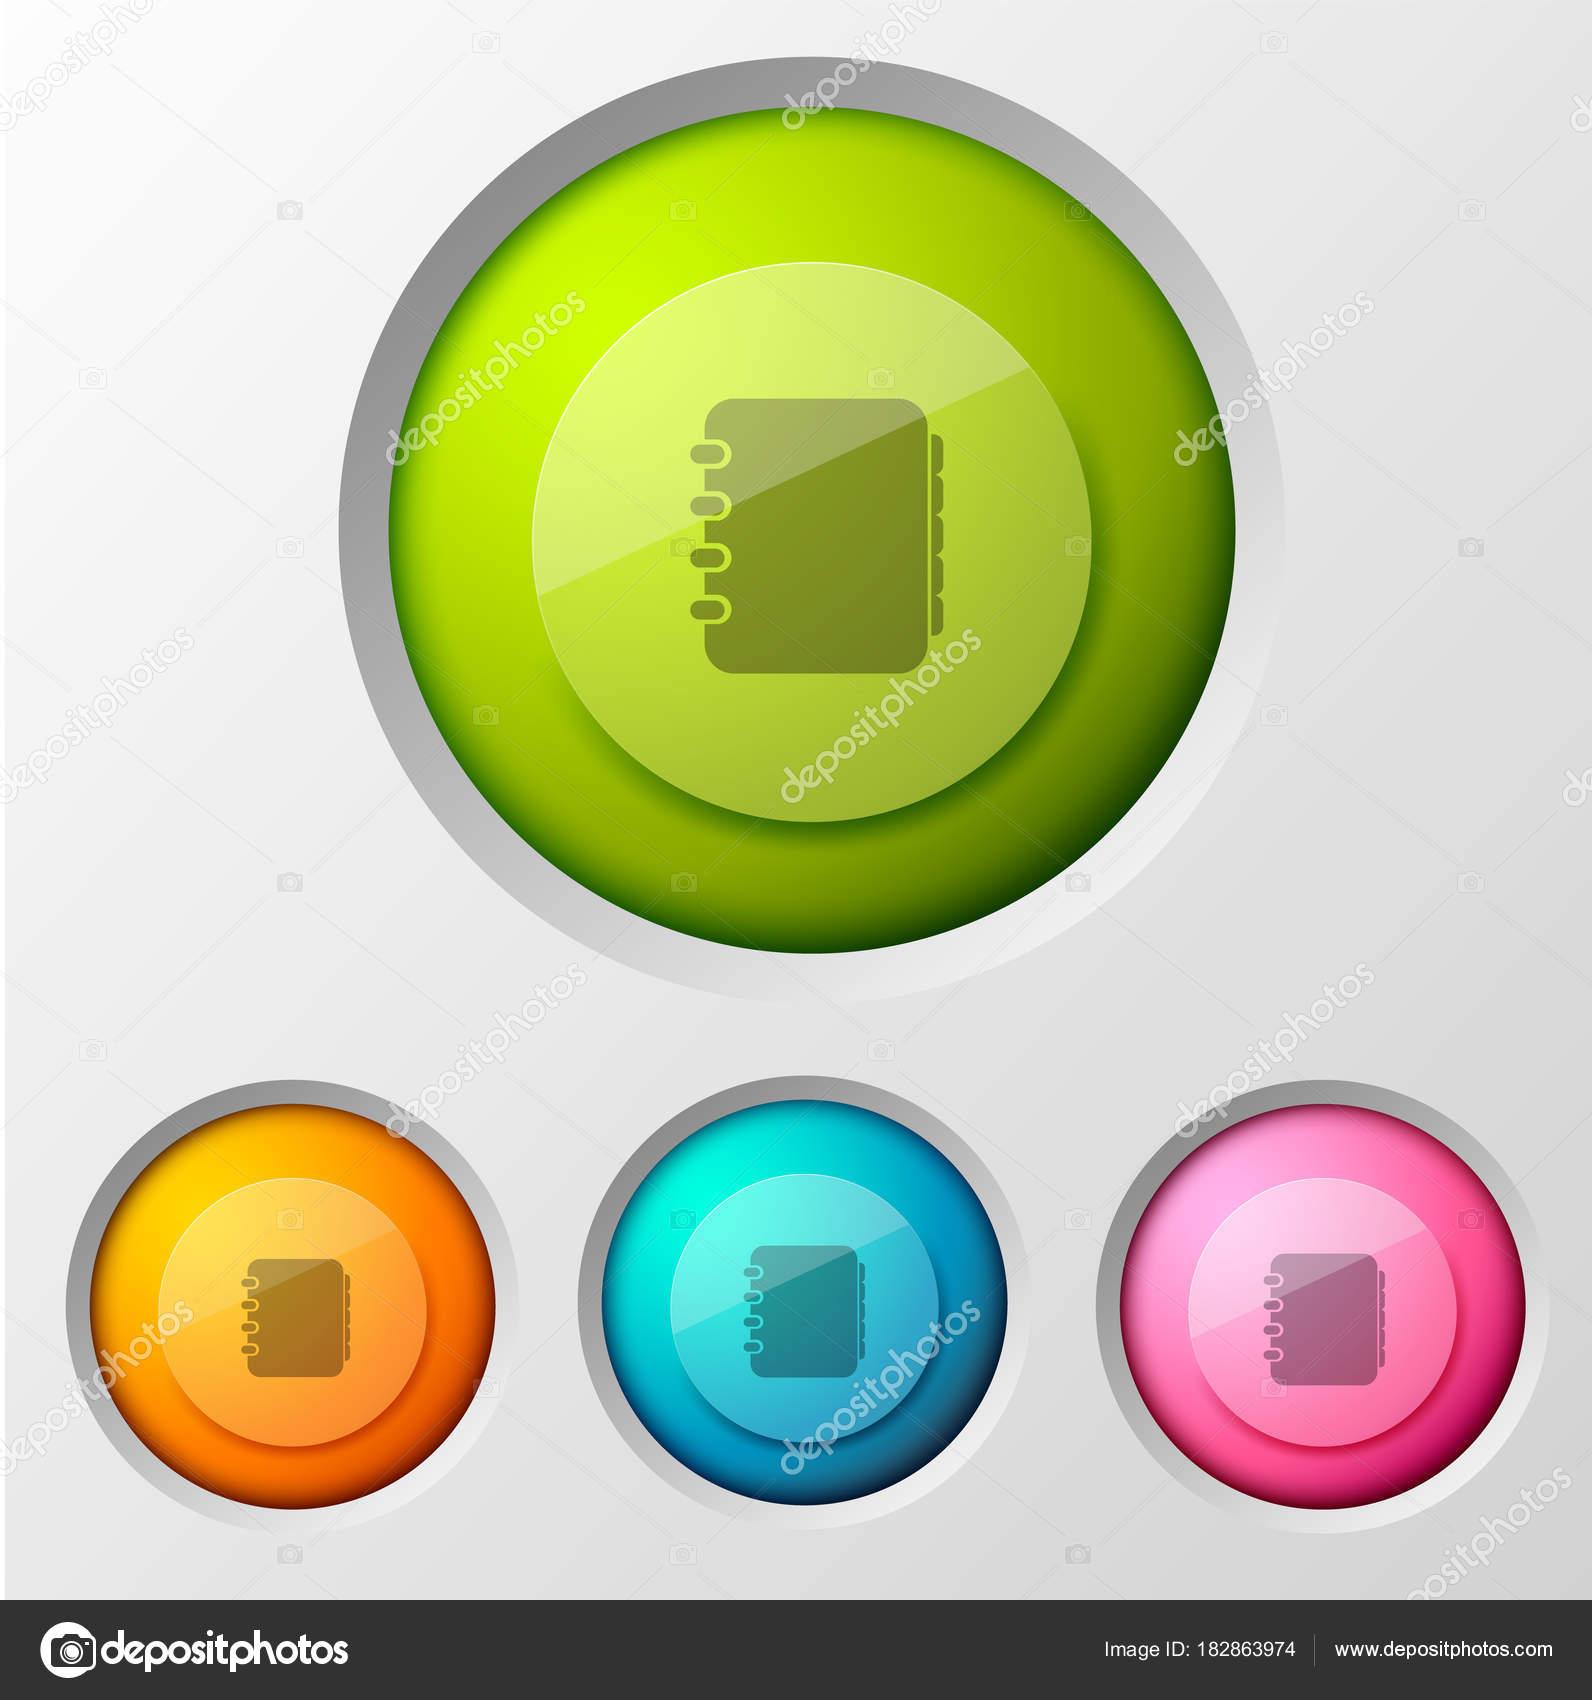 a4d978c33f Επικοινωνήστε με την επιχειρηματική ιδέα με γράφημα βιβλίο εφαρμογή  εικονόγραμμα στο πολύχρωμο στρογγυλή σύνθεση οθόνη αφής διεπαφή κουμπί  εικονογράφηση ...